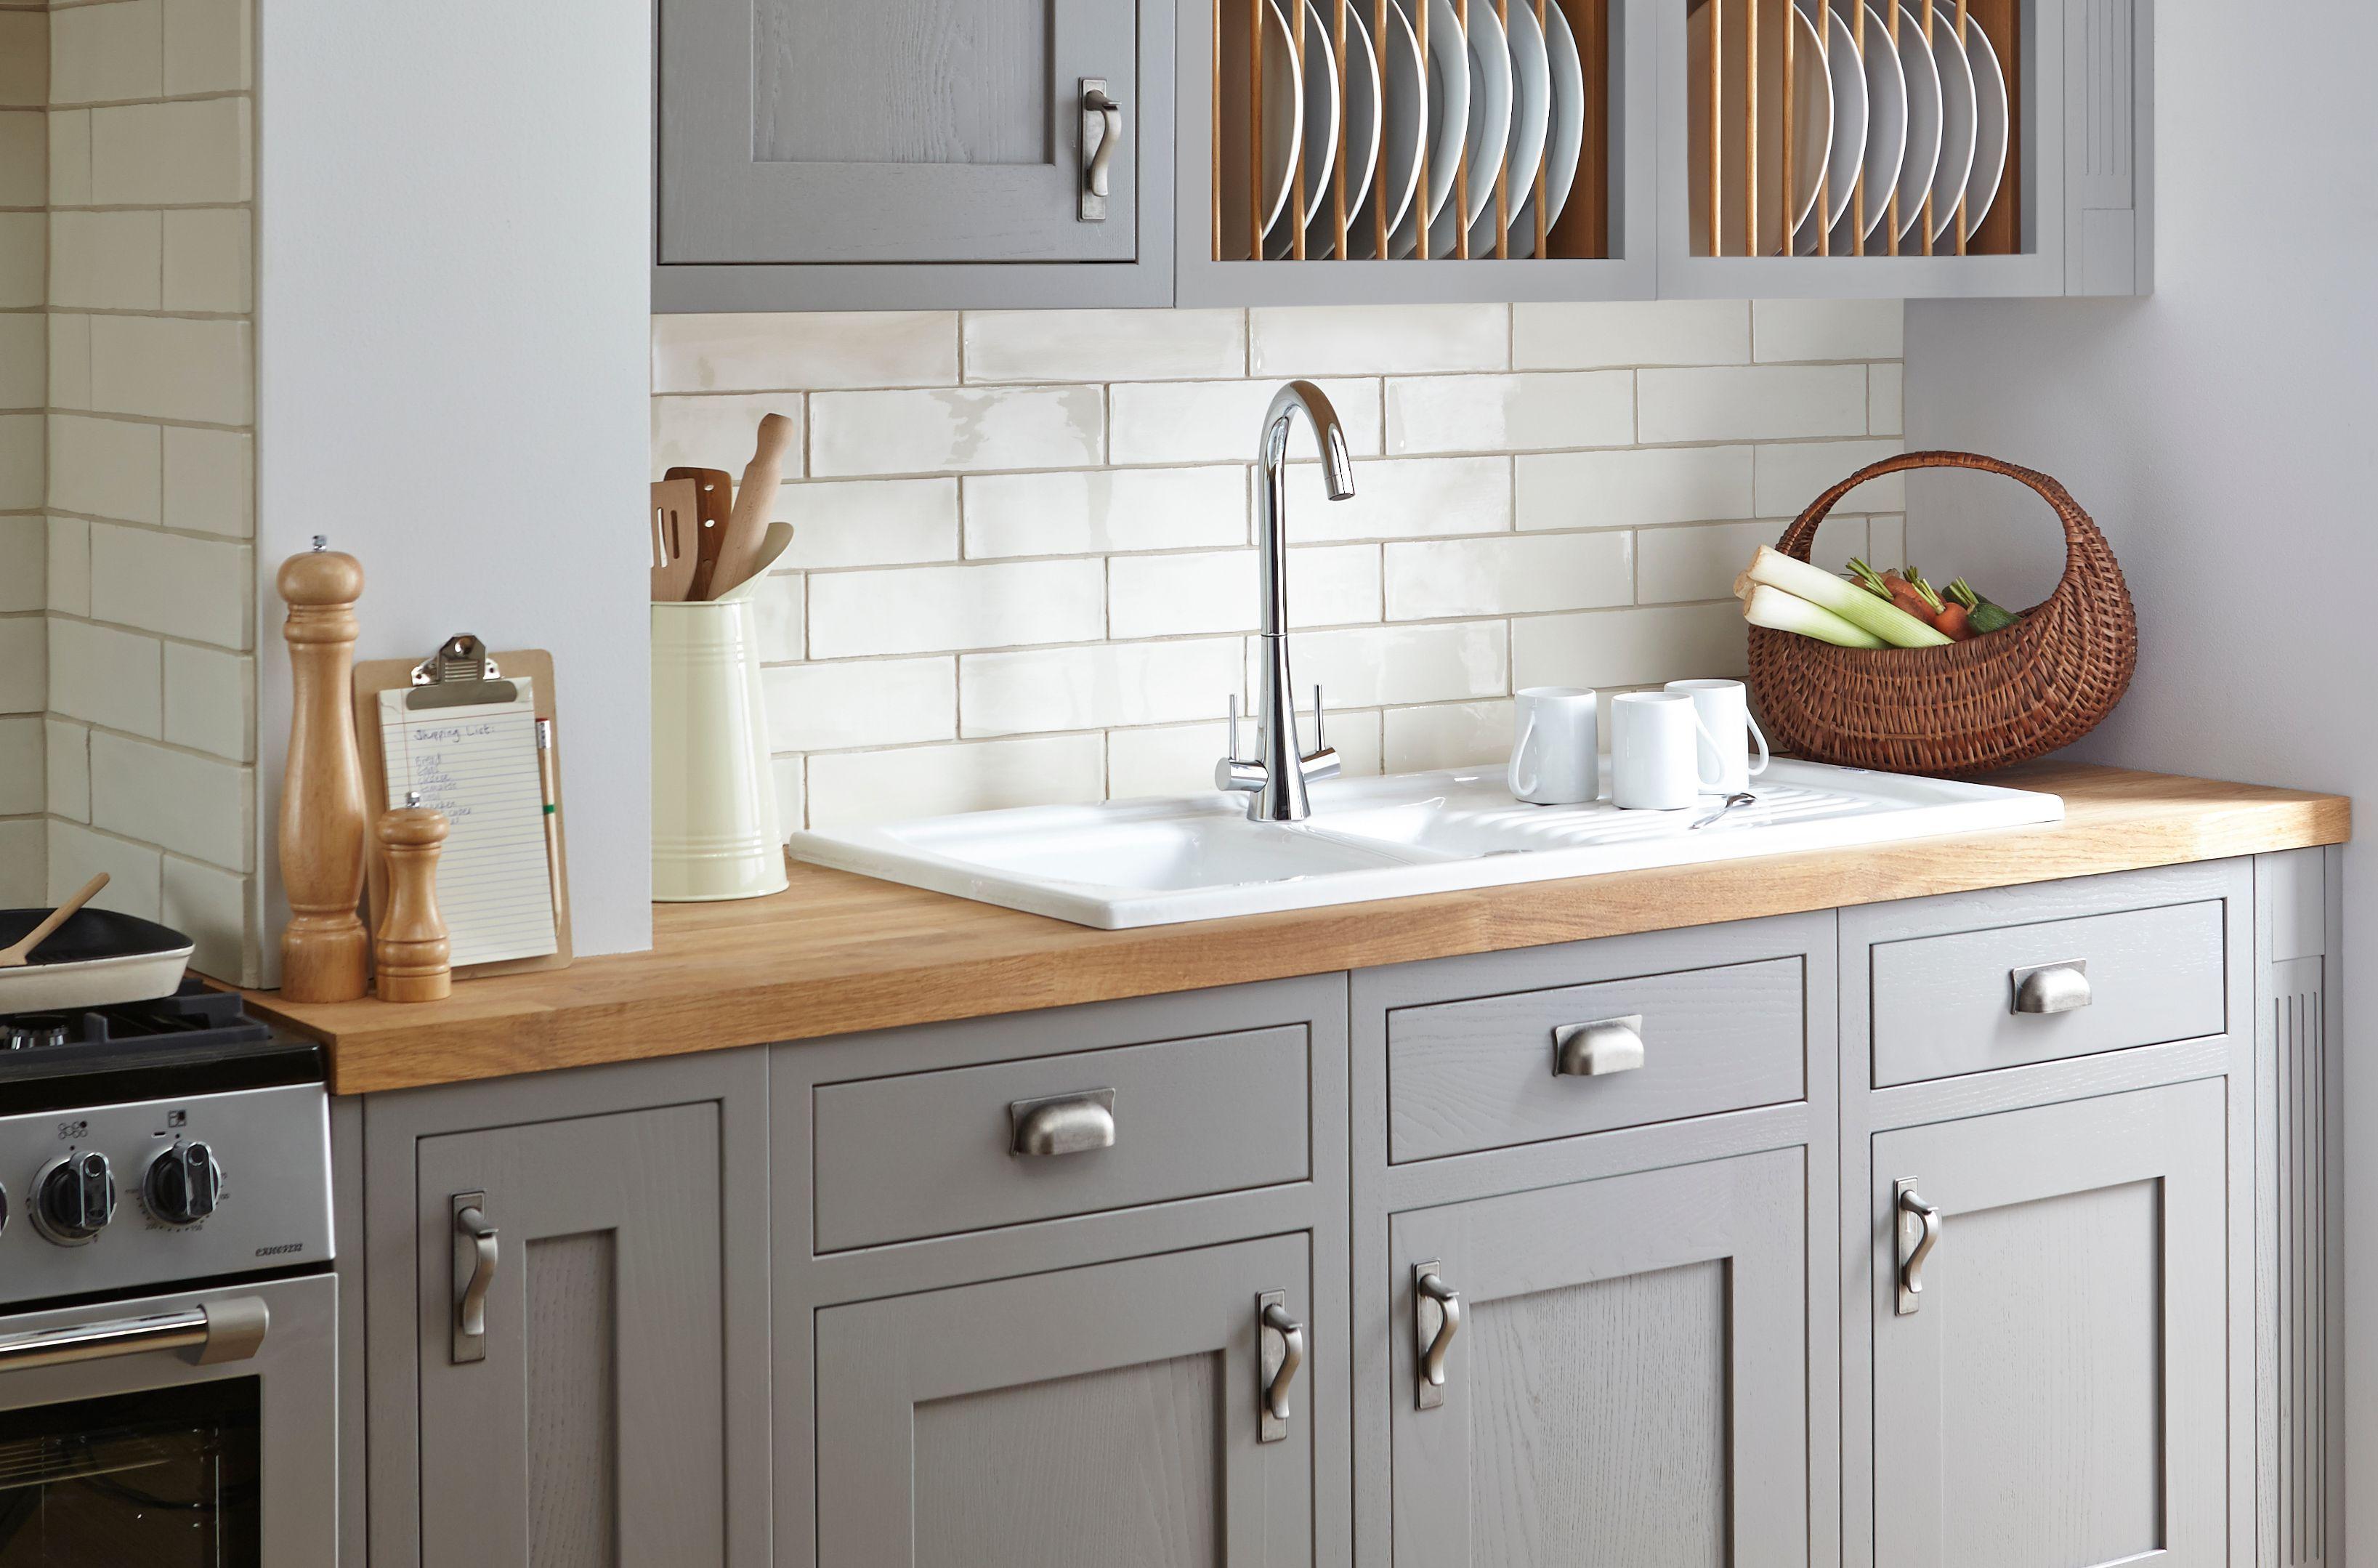 b&q kitchens the honest kitchen perfect form cooke lewis carisbrooke taupe framed diy at b q dolaplar